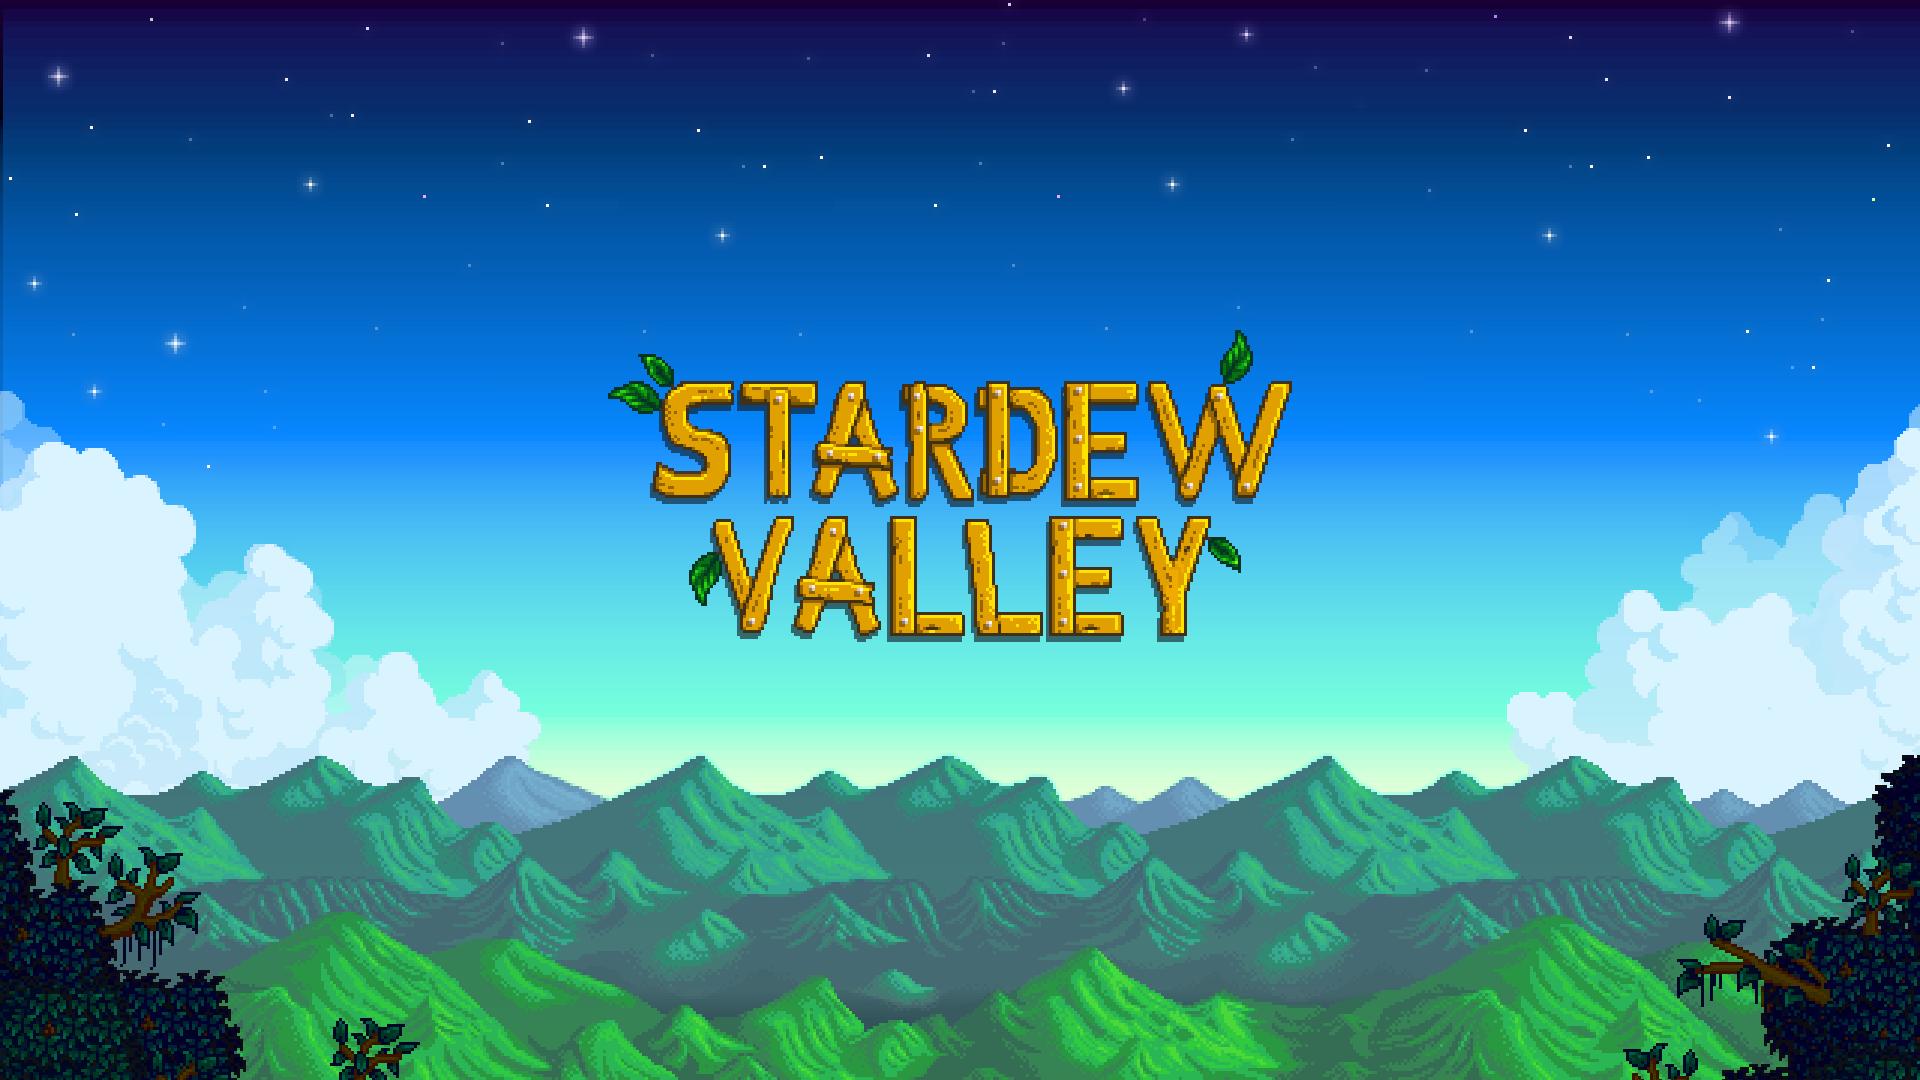 stardew valley, best nintendo switch indie games, top 10